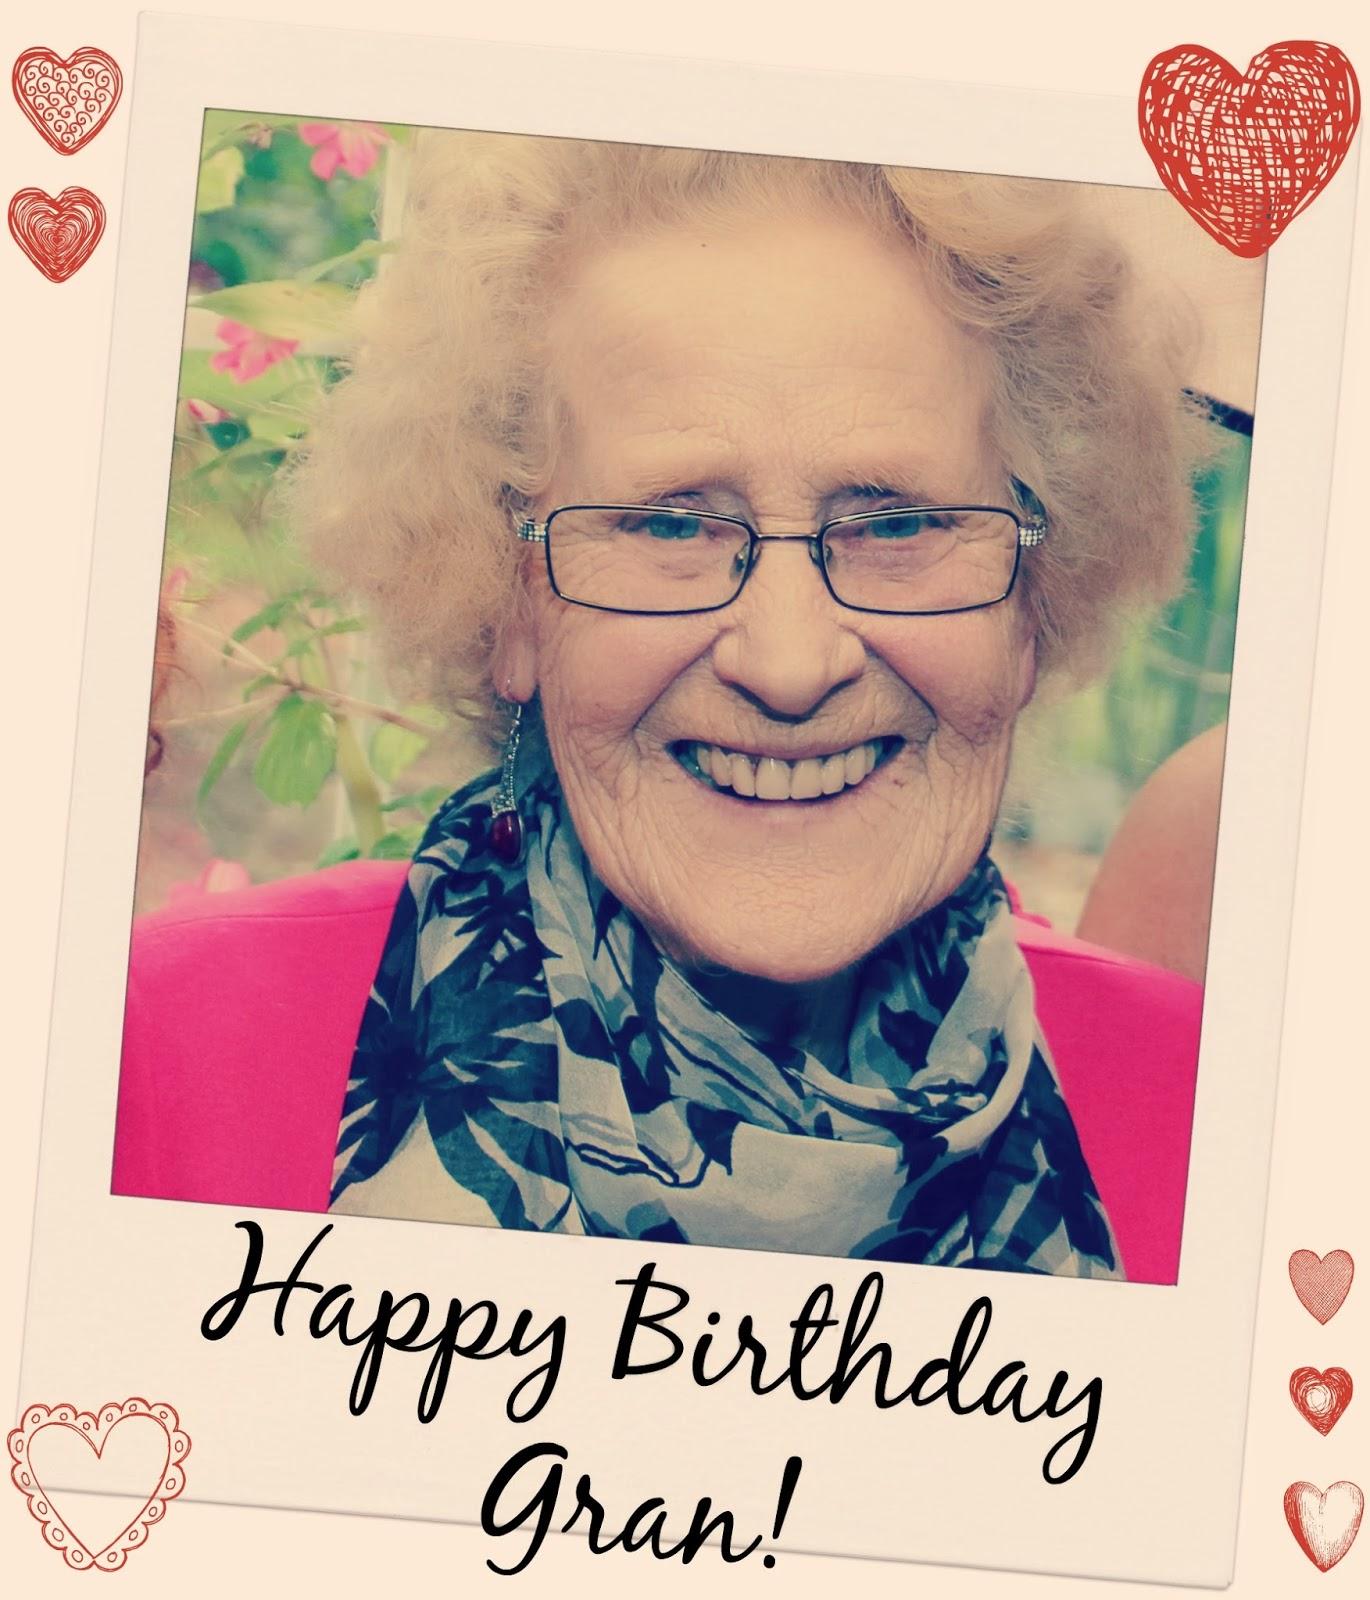 Big Blonde Girl: To My Gran, Happy Birthday